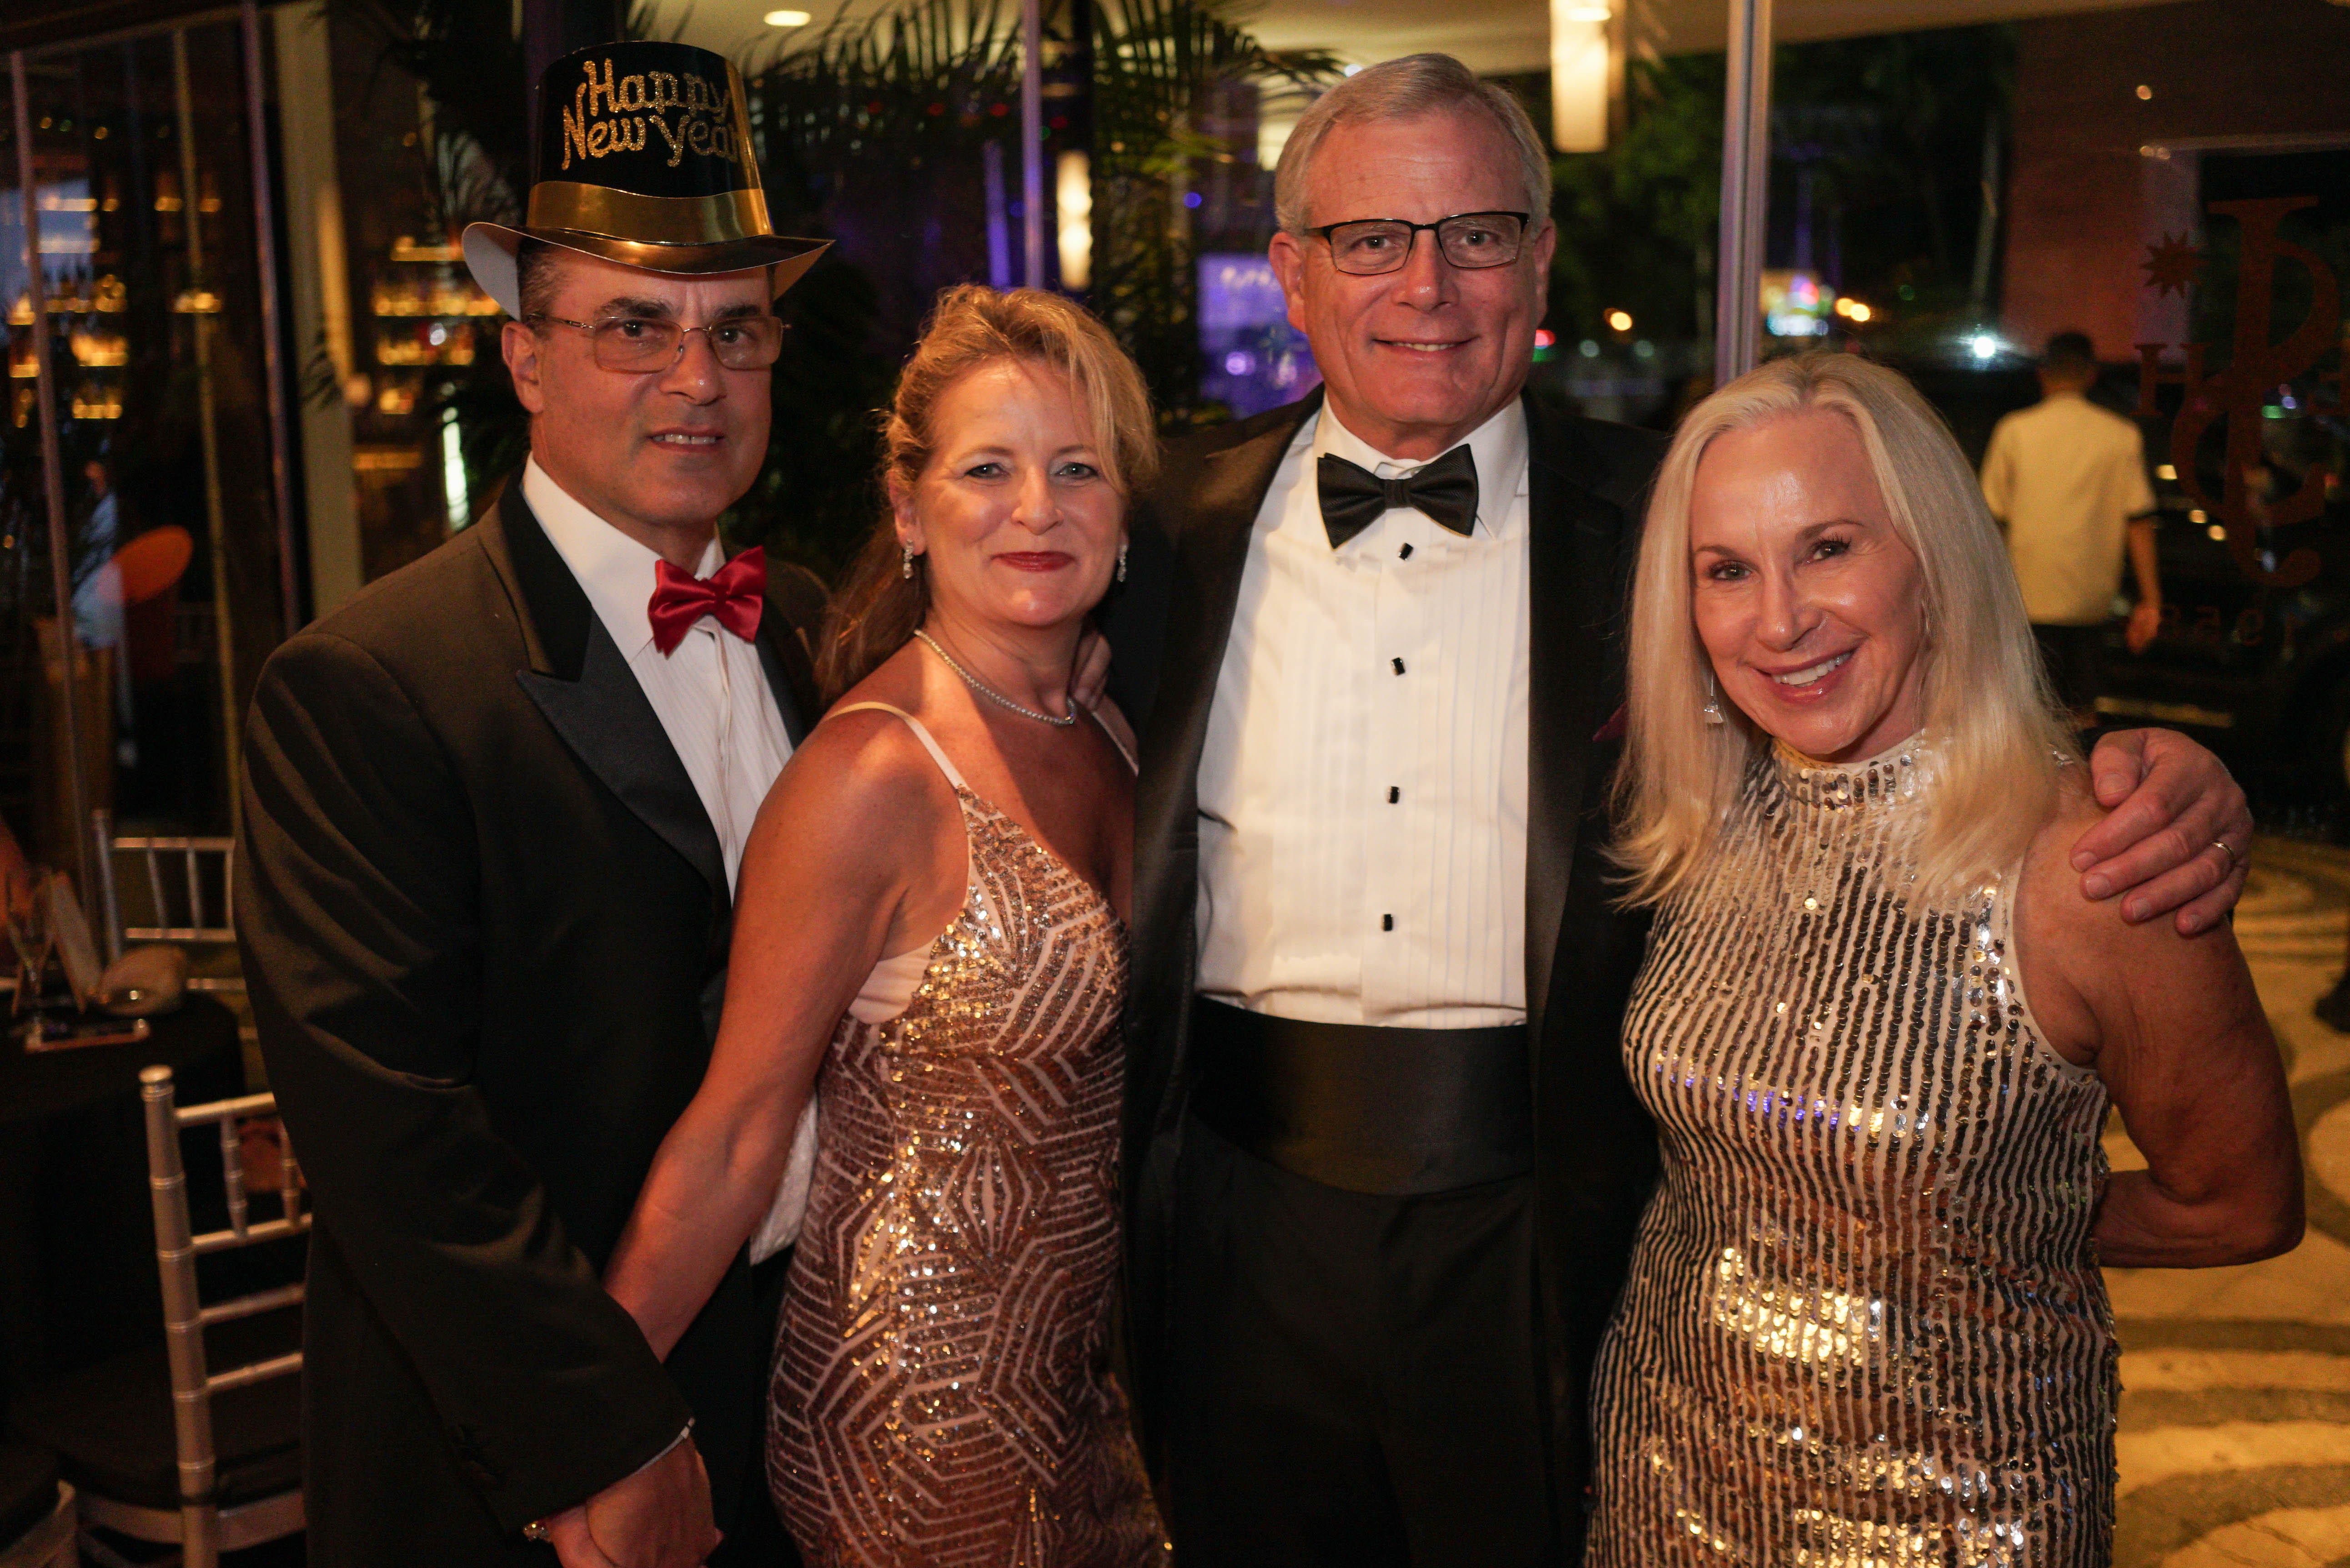 Frank Maiolo, Anna Maiolo, Mark Elsinger y Susan Elsinger. (Suministrada)